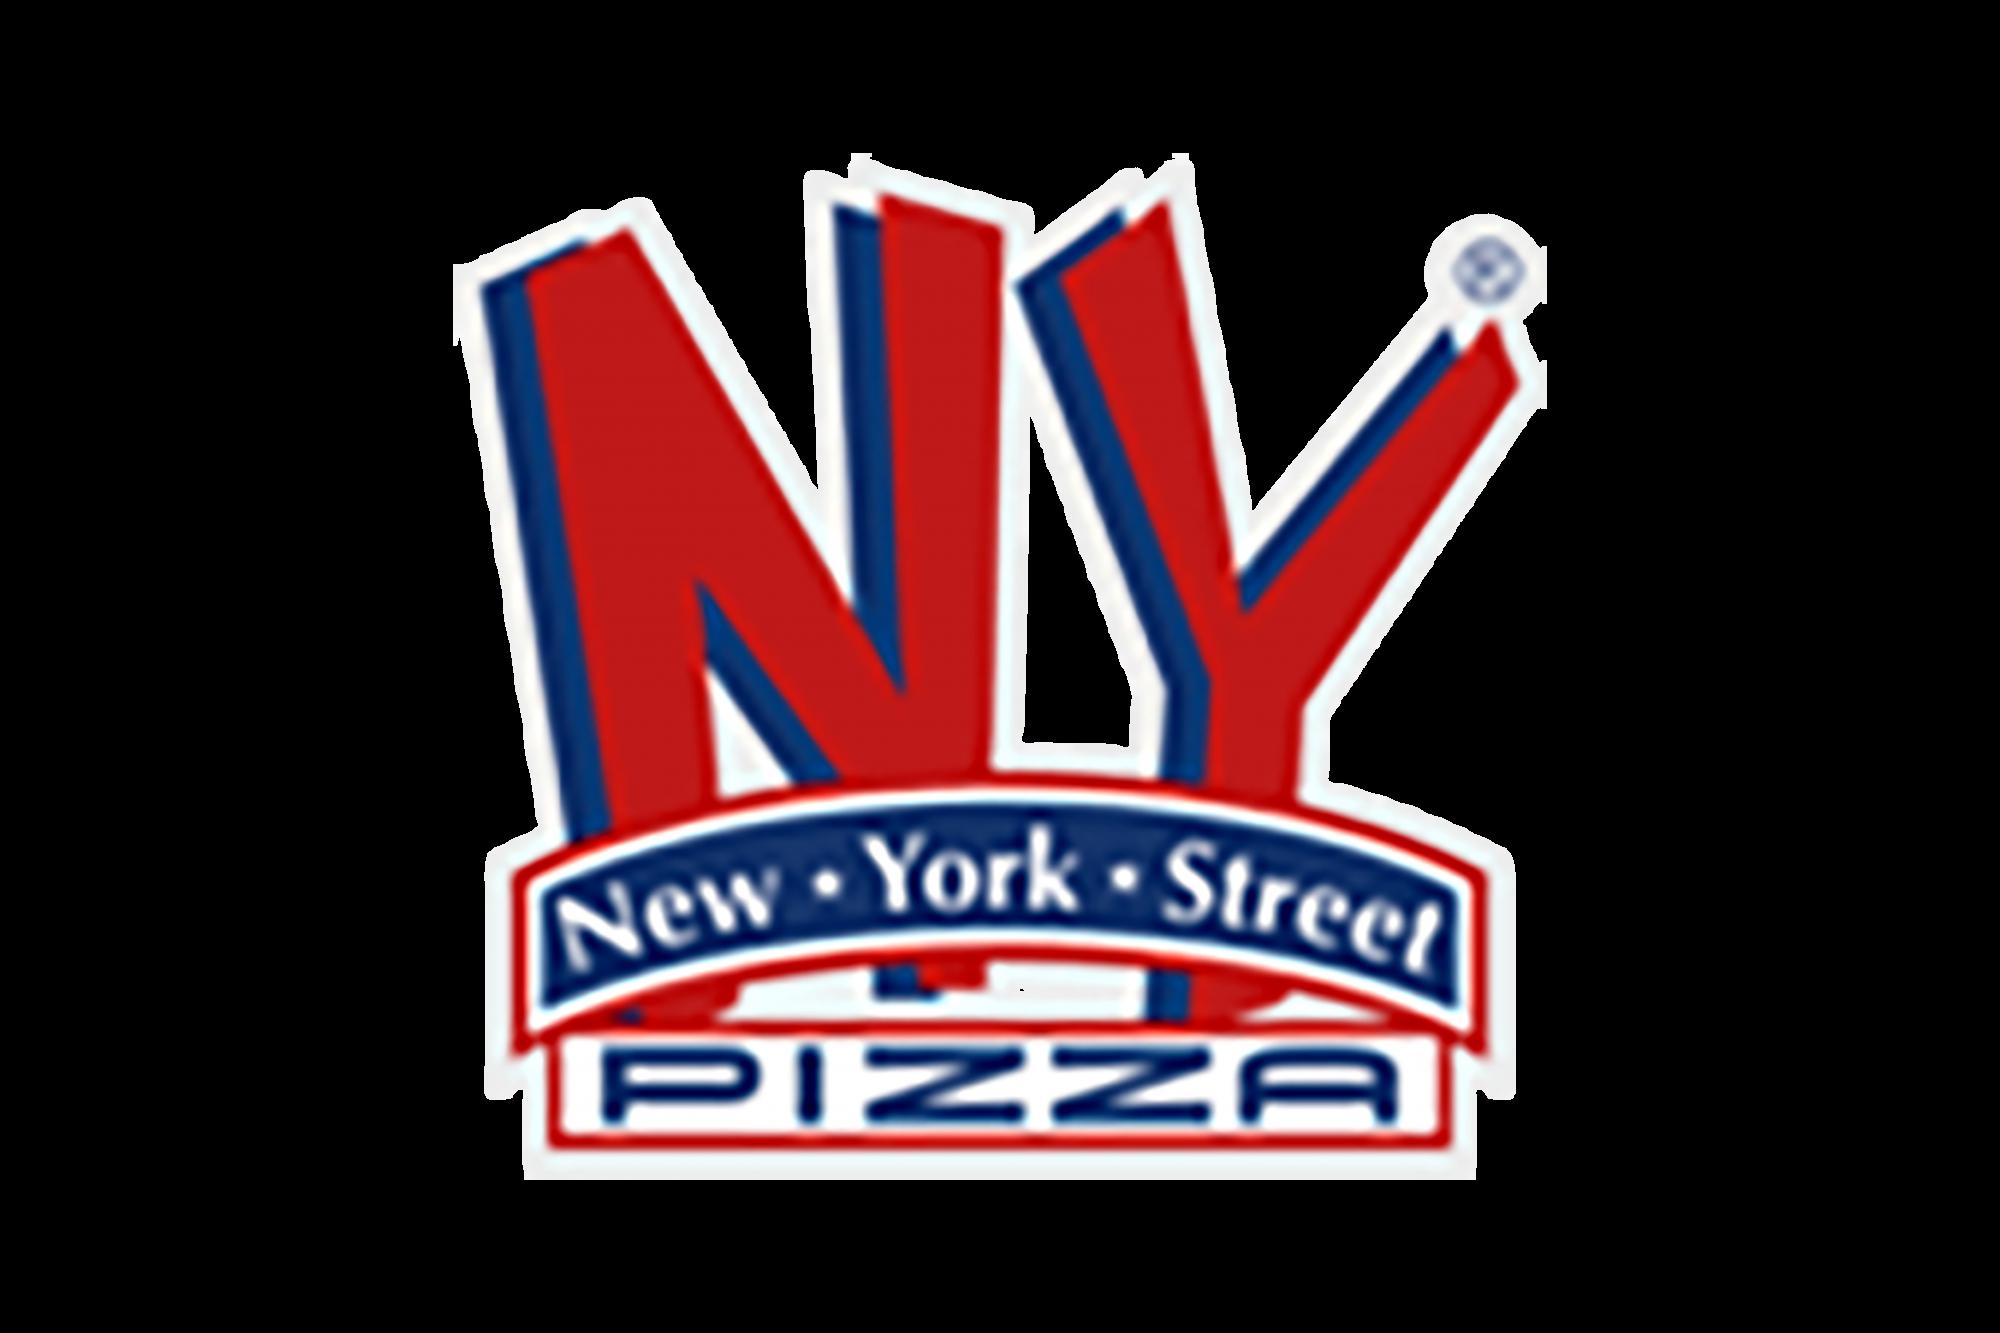 Логотип заведения New York Street Pizza